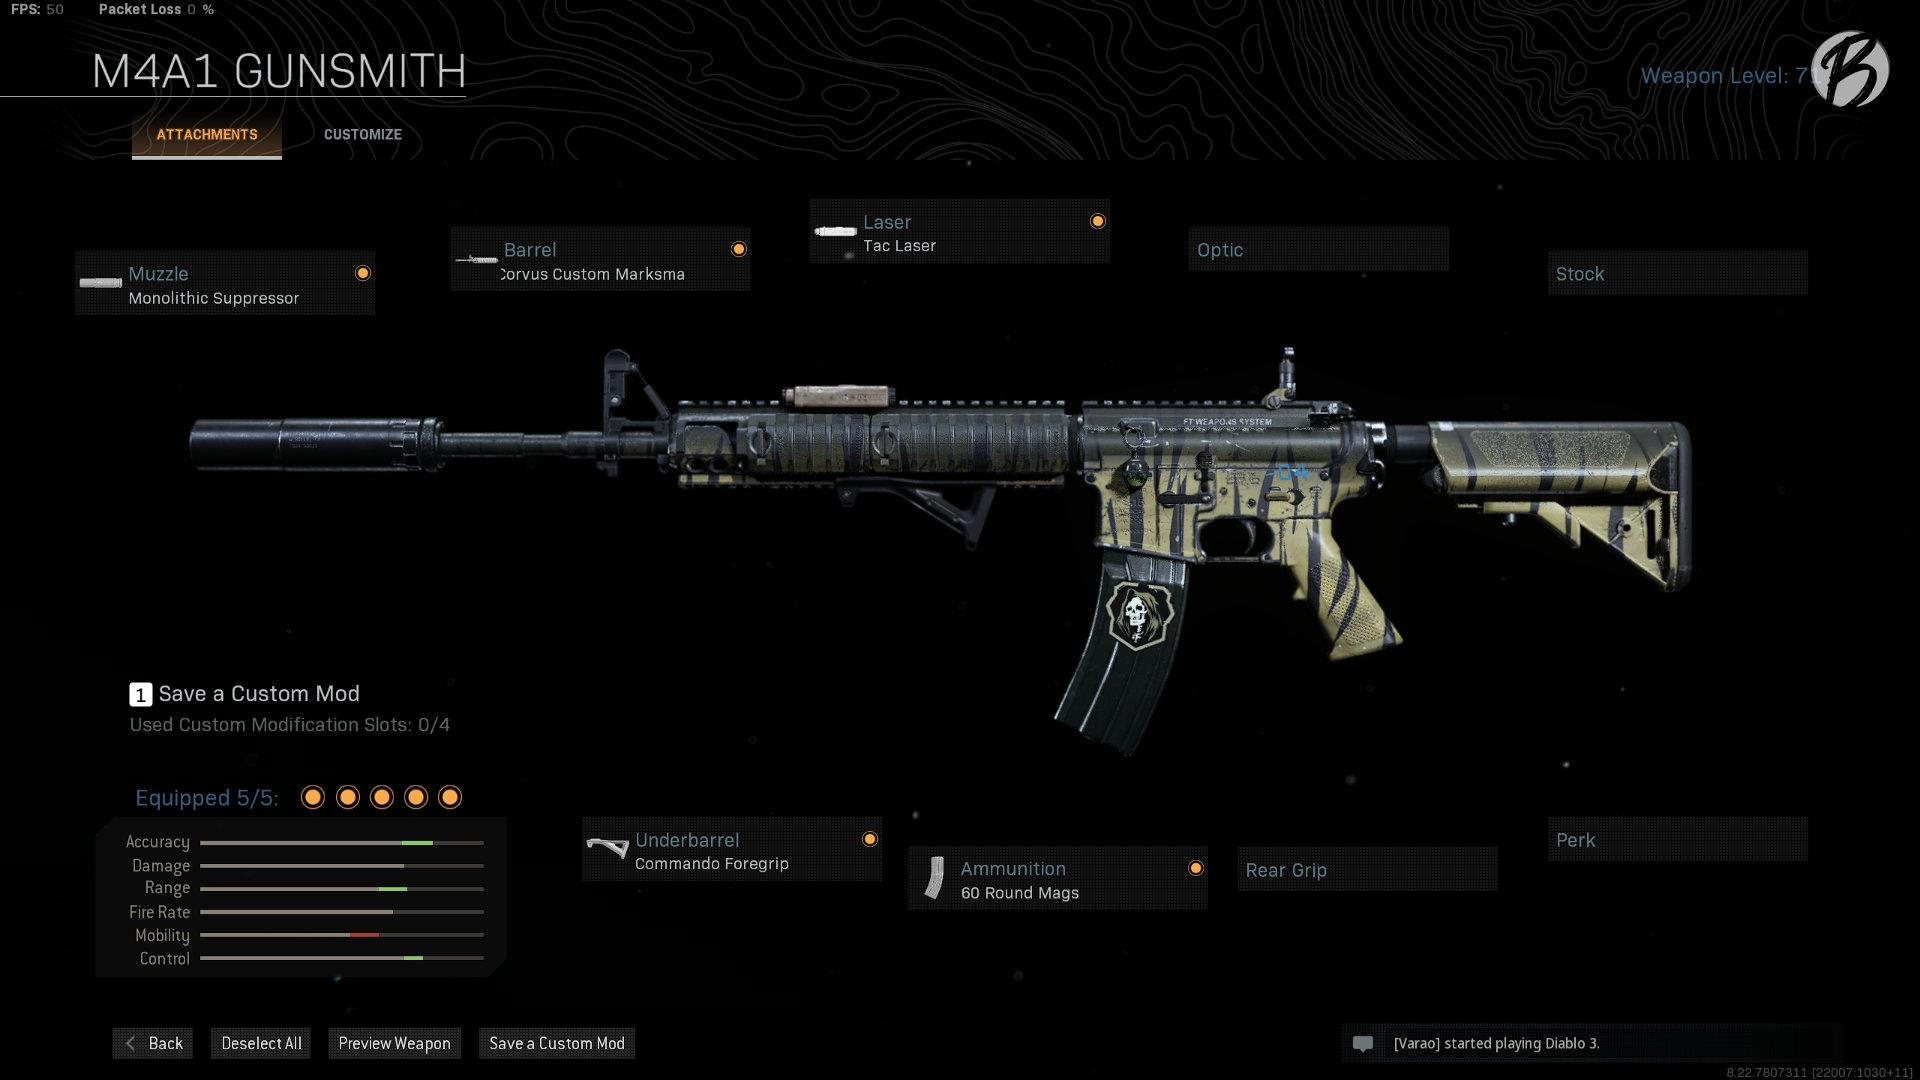 M4A1: Monolithic Suppressor, Corvus Custom Marksman, Tac Laser, Commando Foregrip, 60 Round Magazin